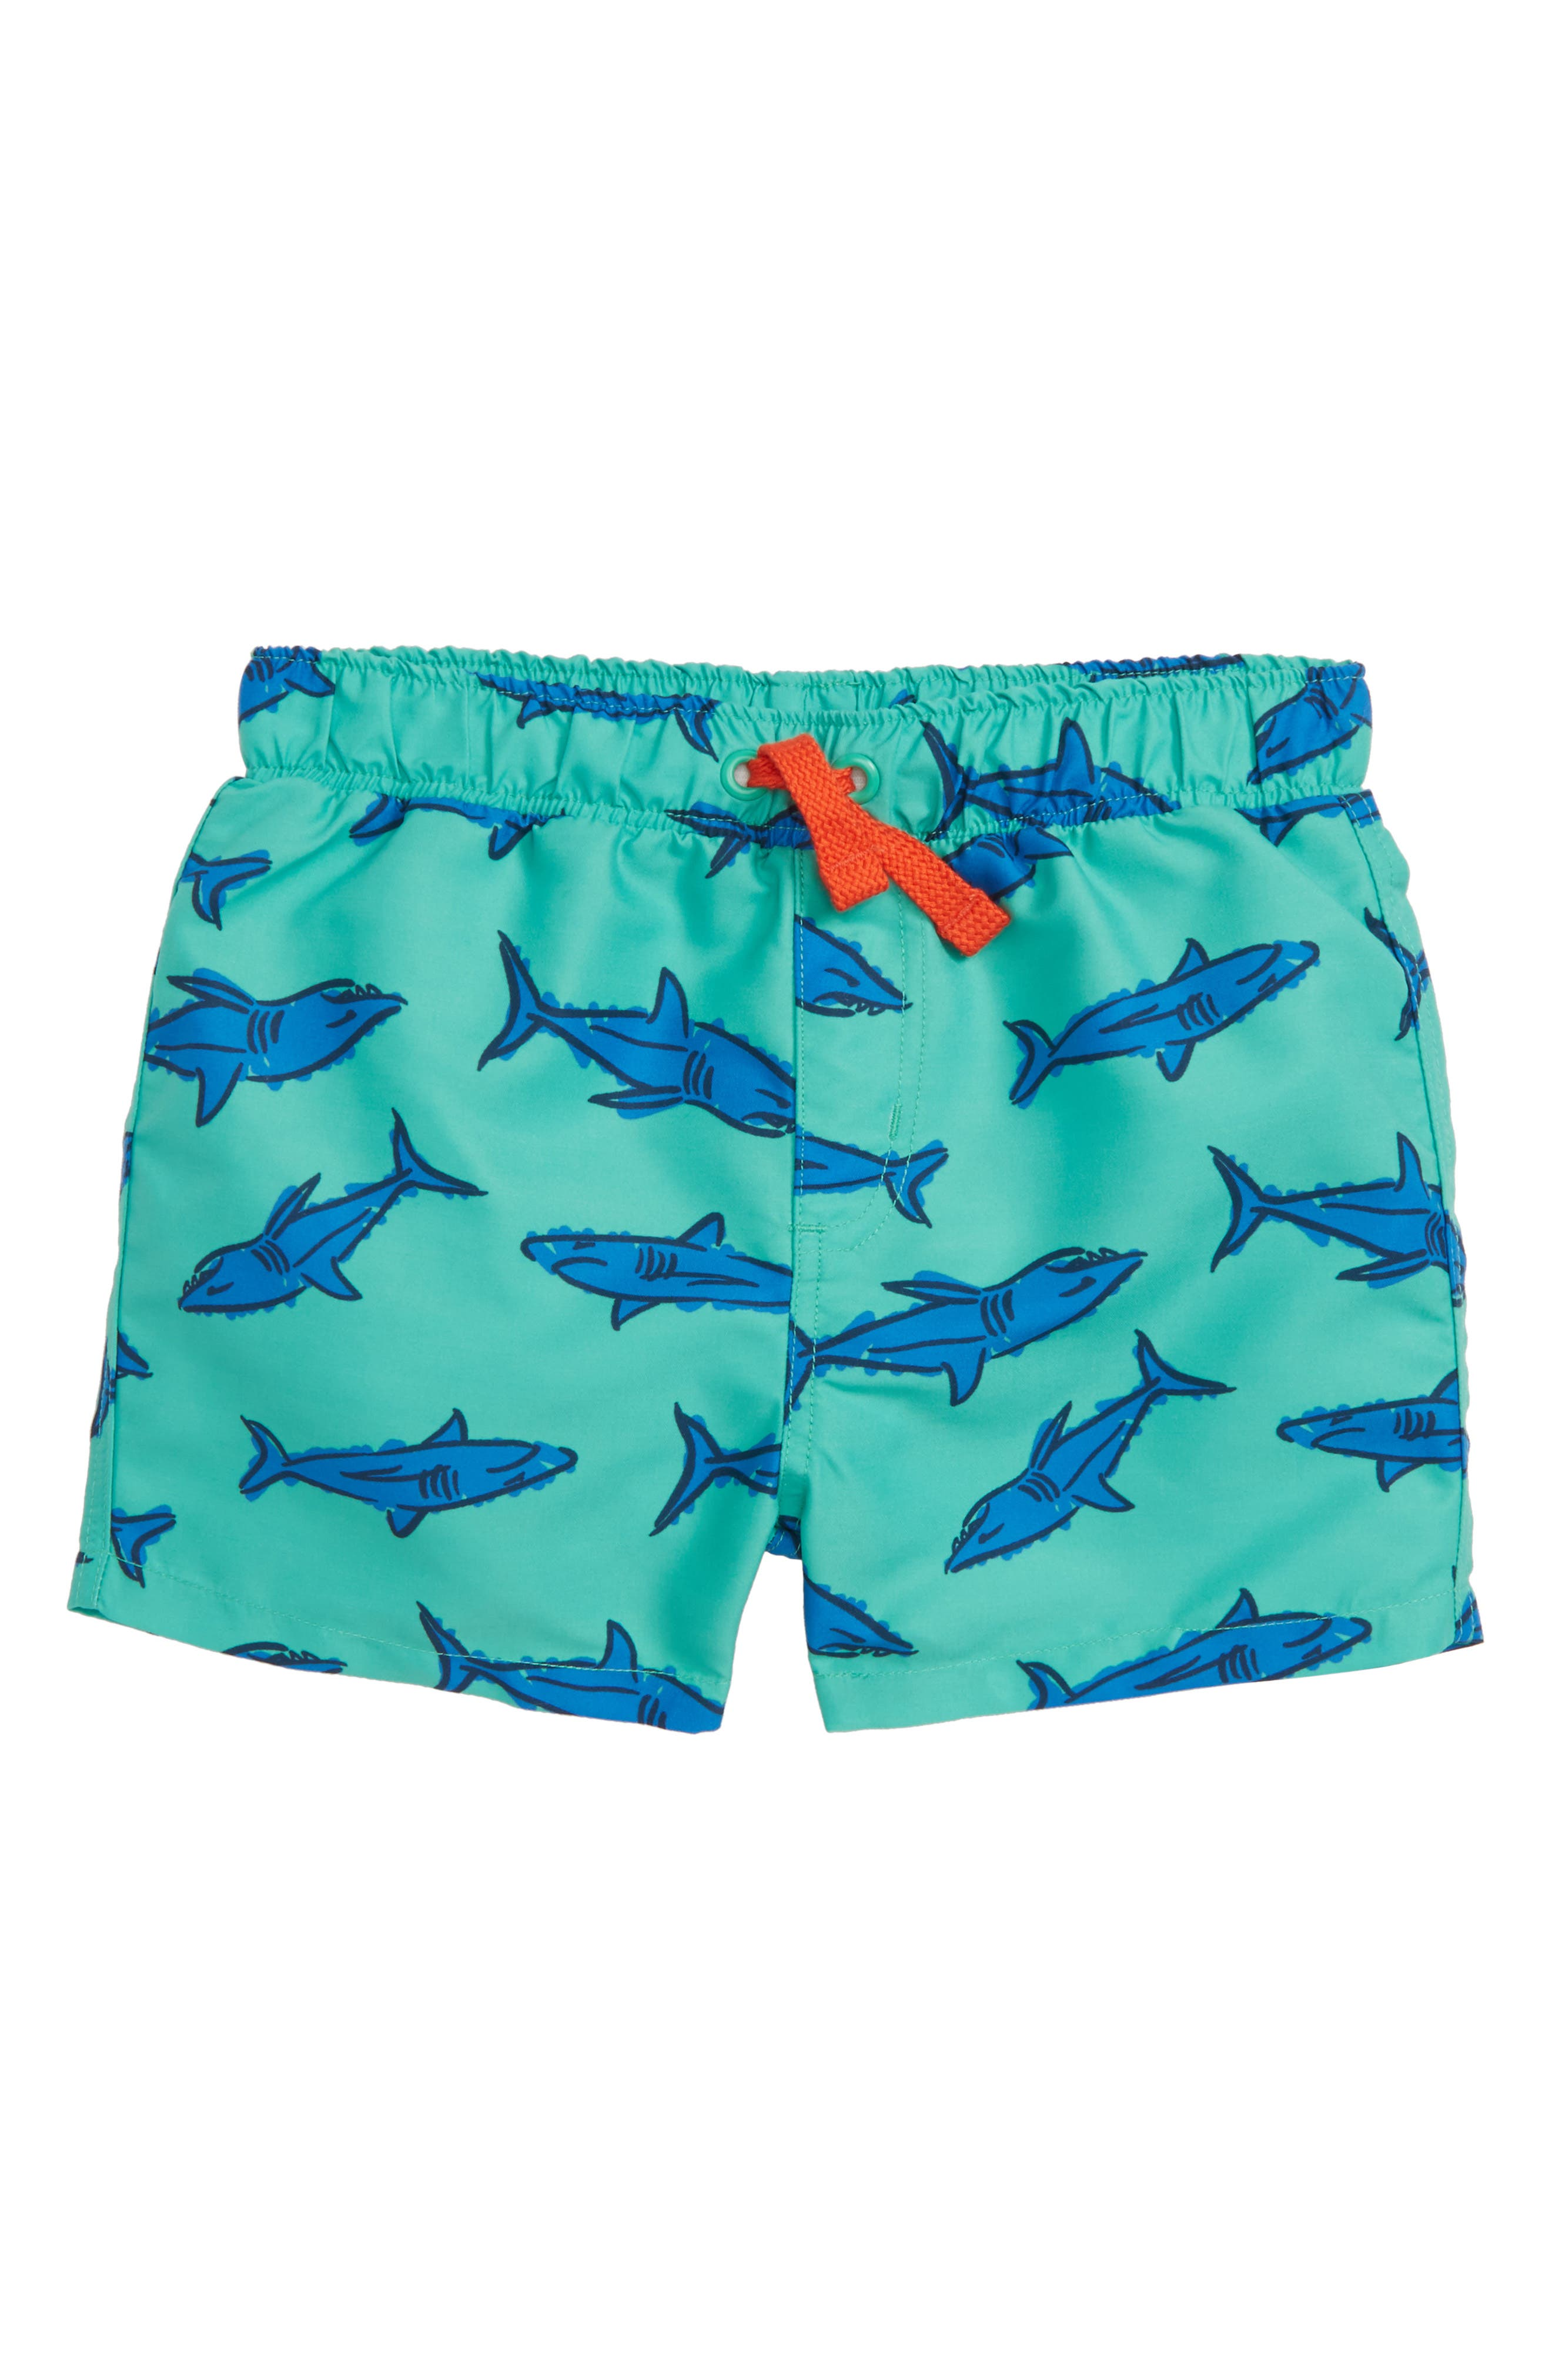 Print Swim Trunks,                         Main,                         color,